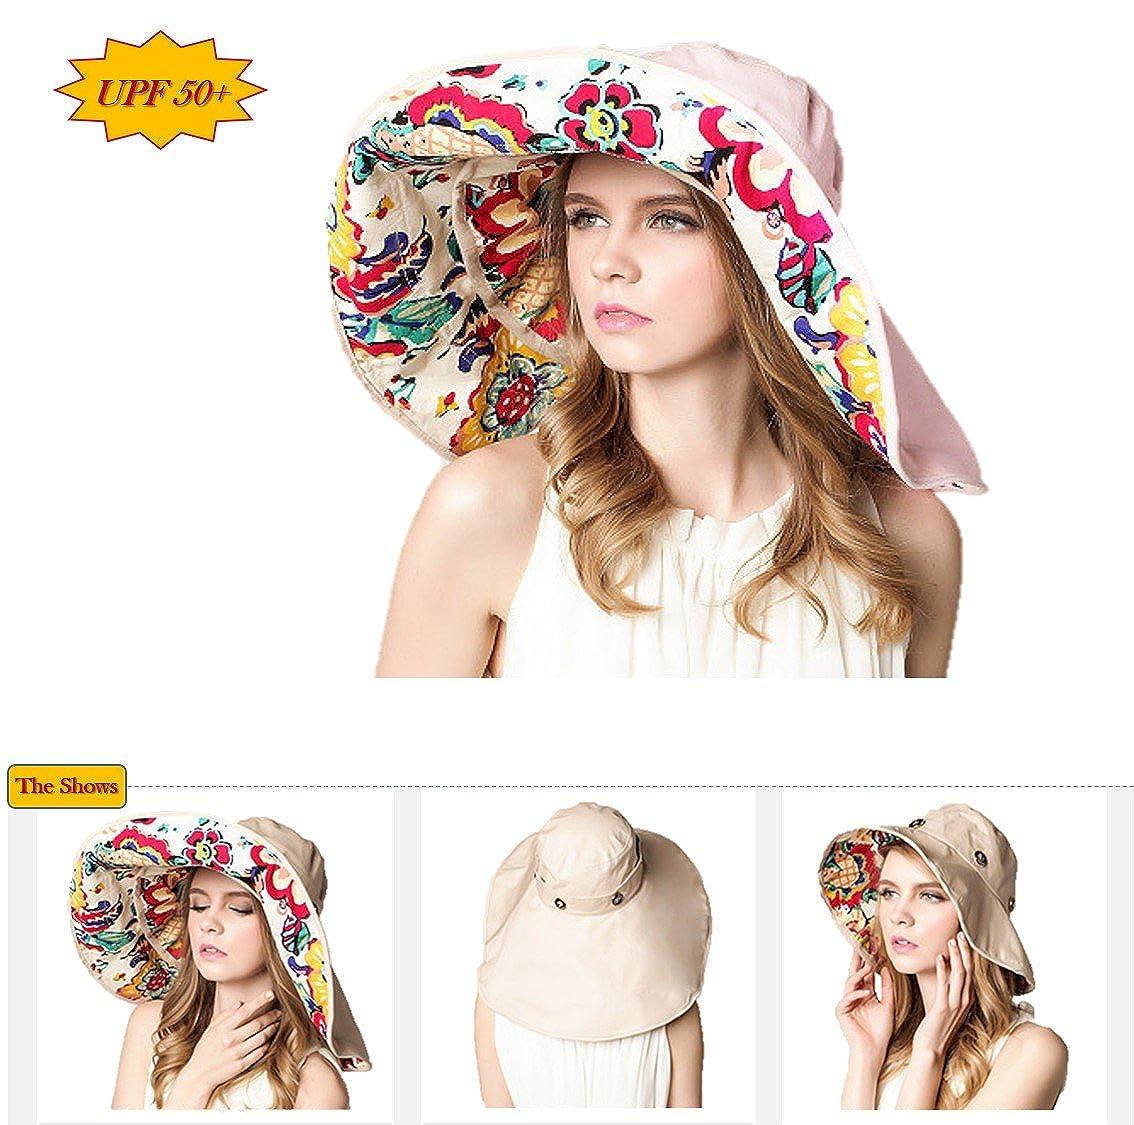 934f494b293 iHomey Packable Extra Large Brim Floppy Sun Hat Reversible UPF 50+ Beach  Sun Bucket Hat Beige at Amazon Women s Clothing store